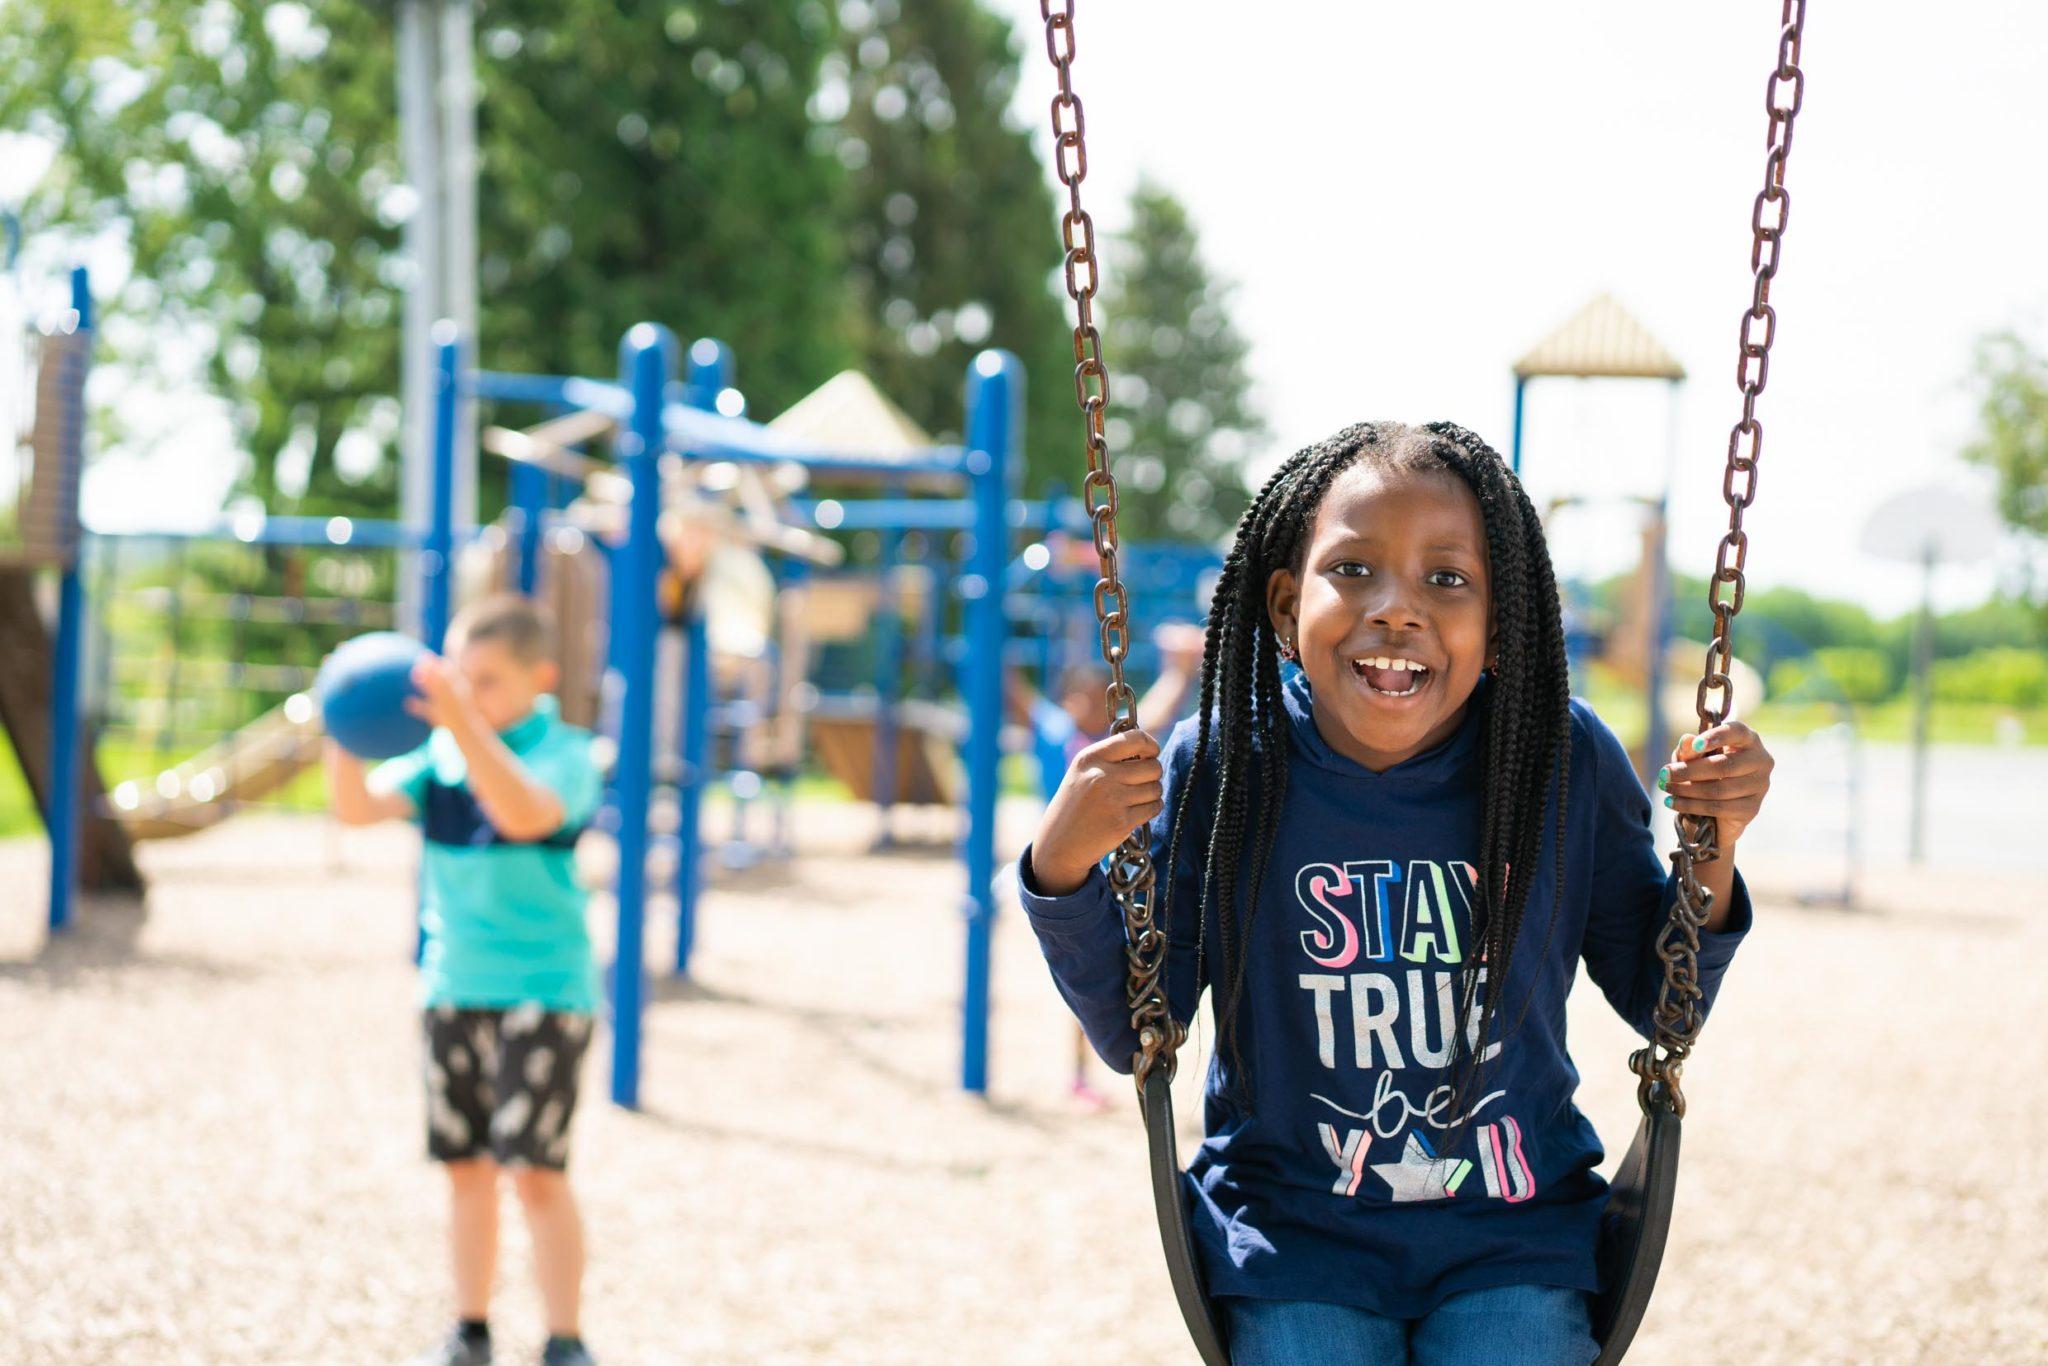 student on playground swings